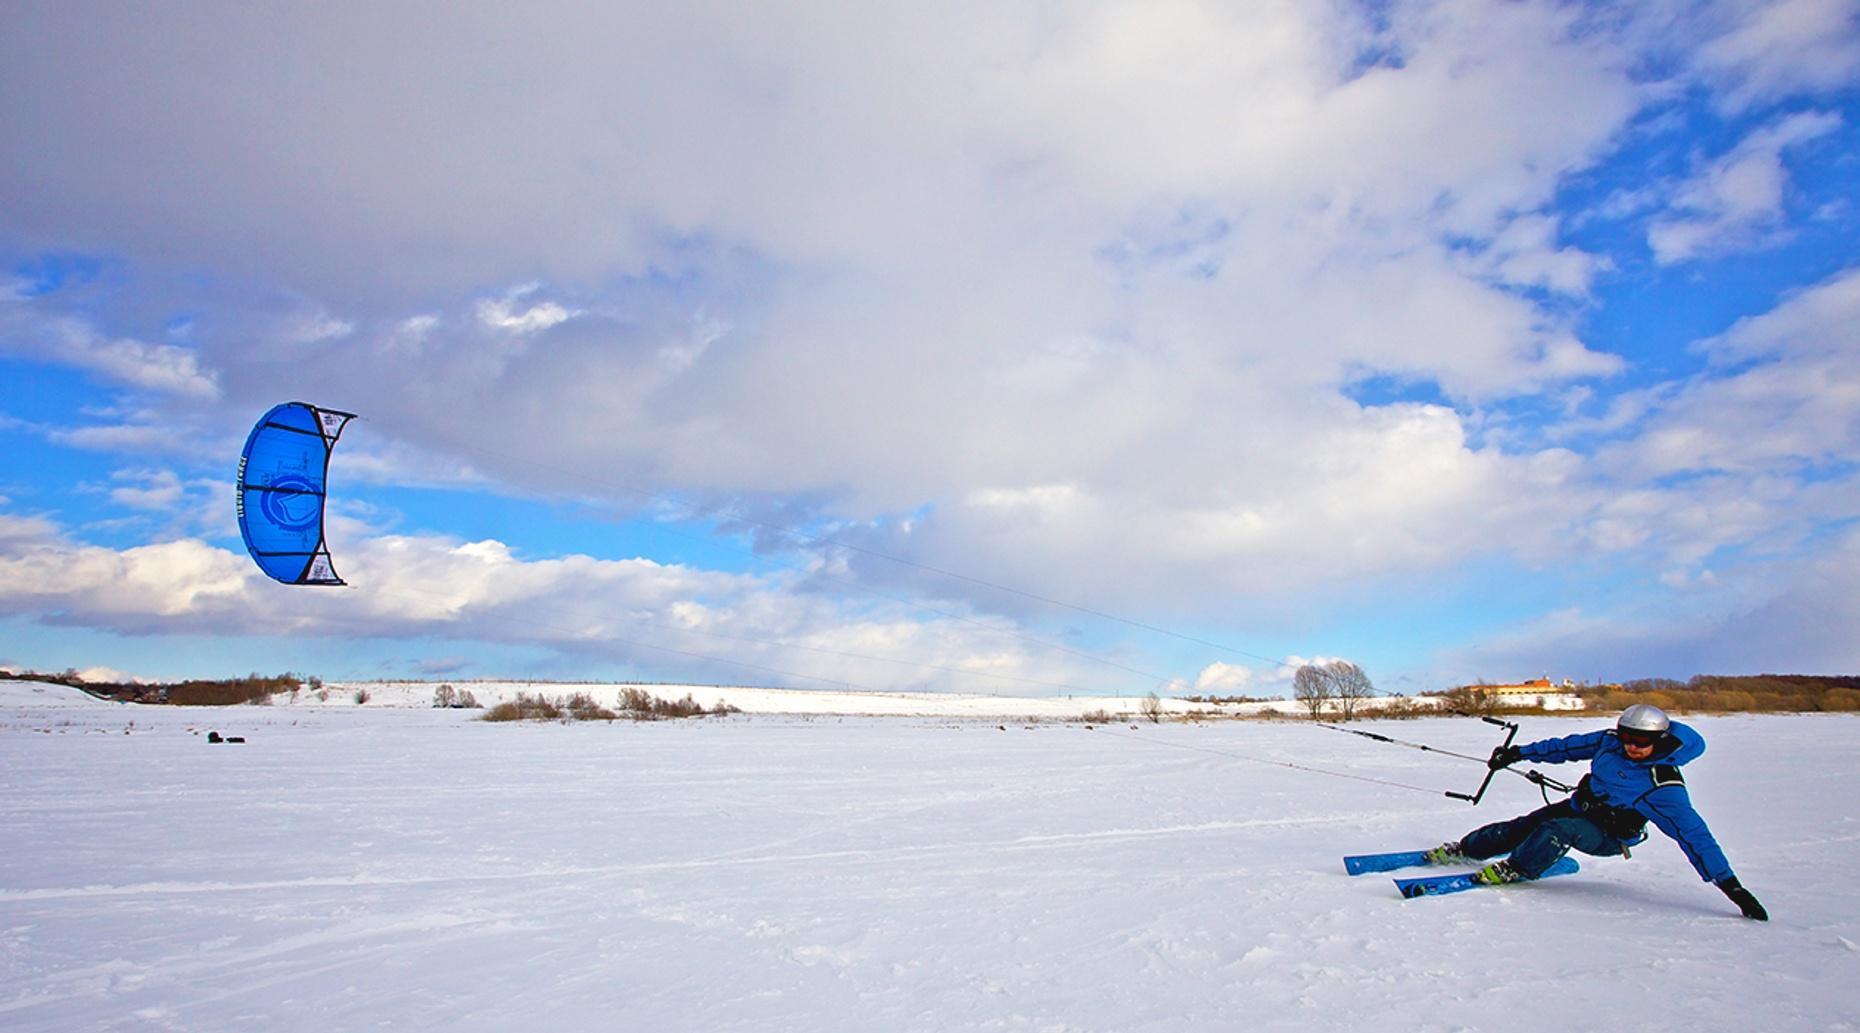 Half-Hour Advance Snowkite Lesson in Silverthorne